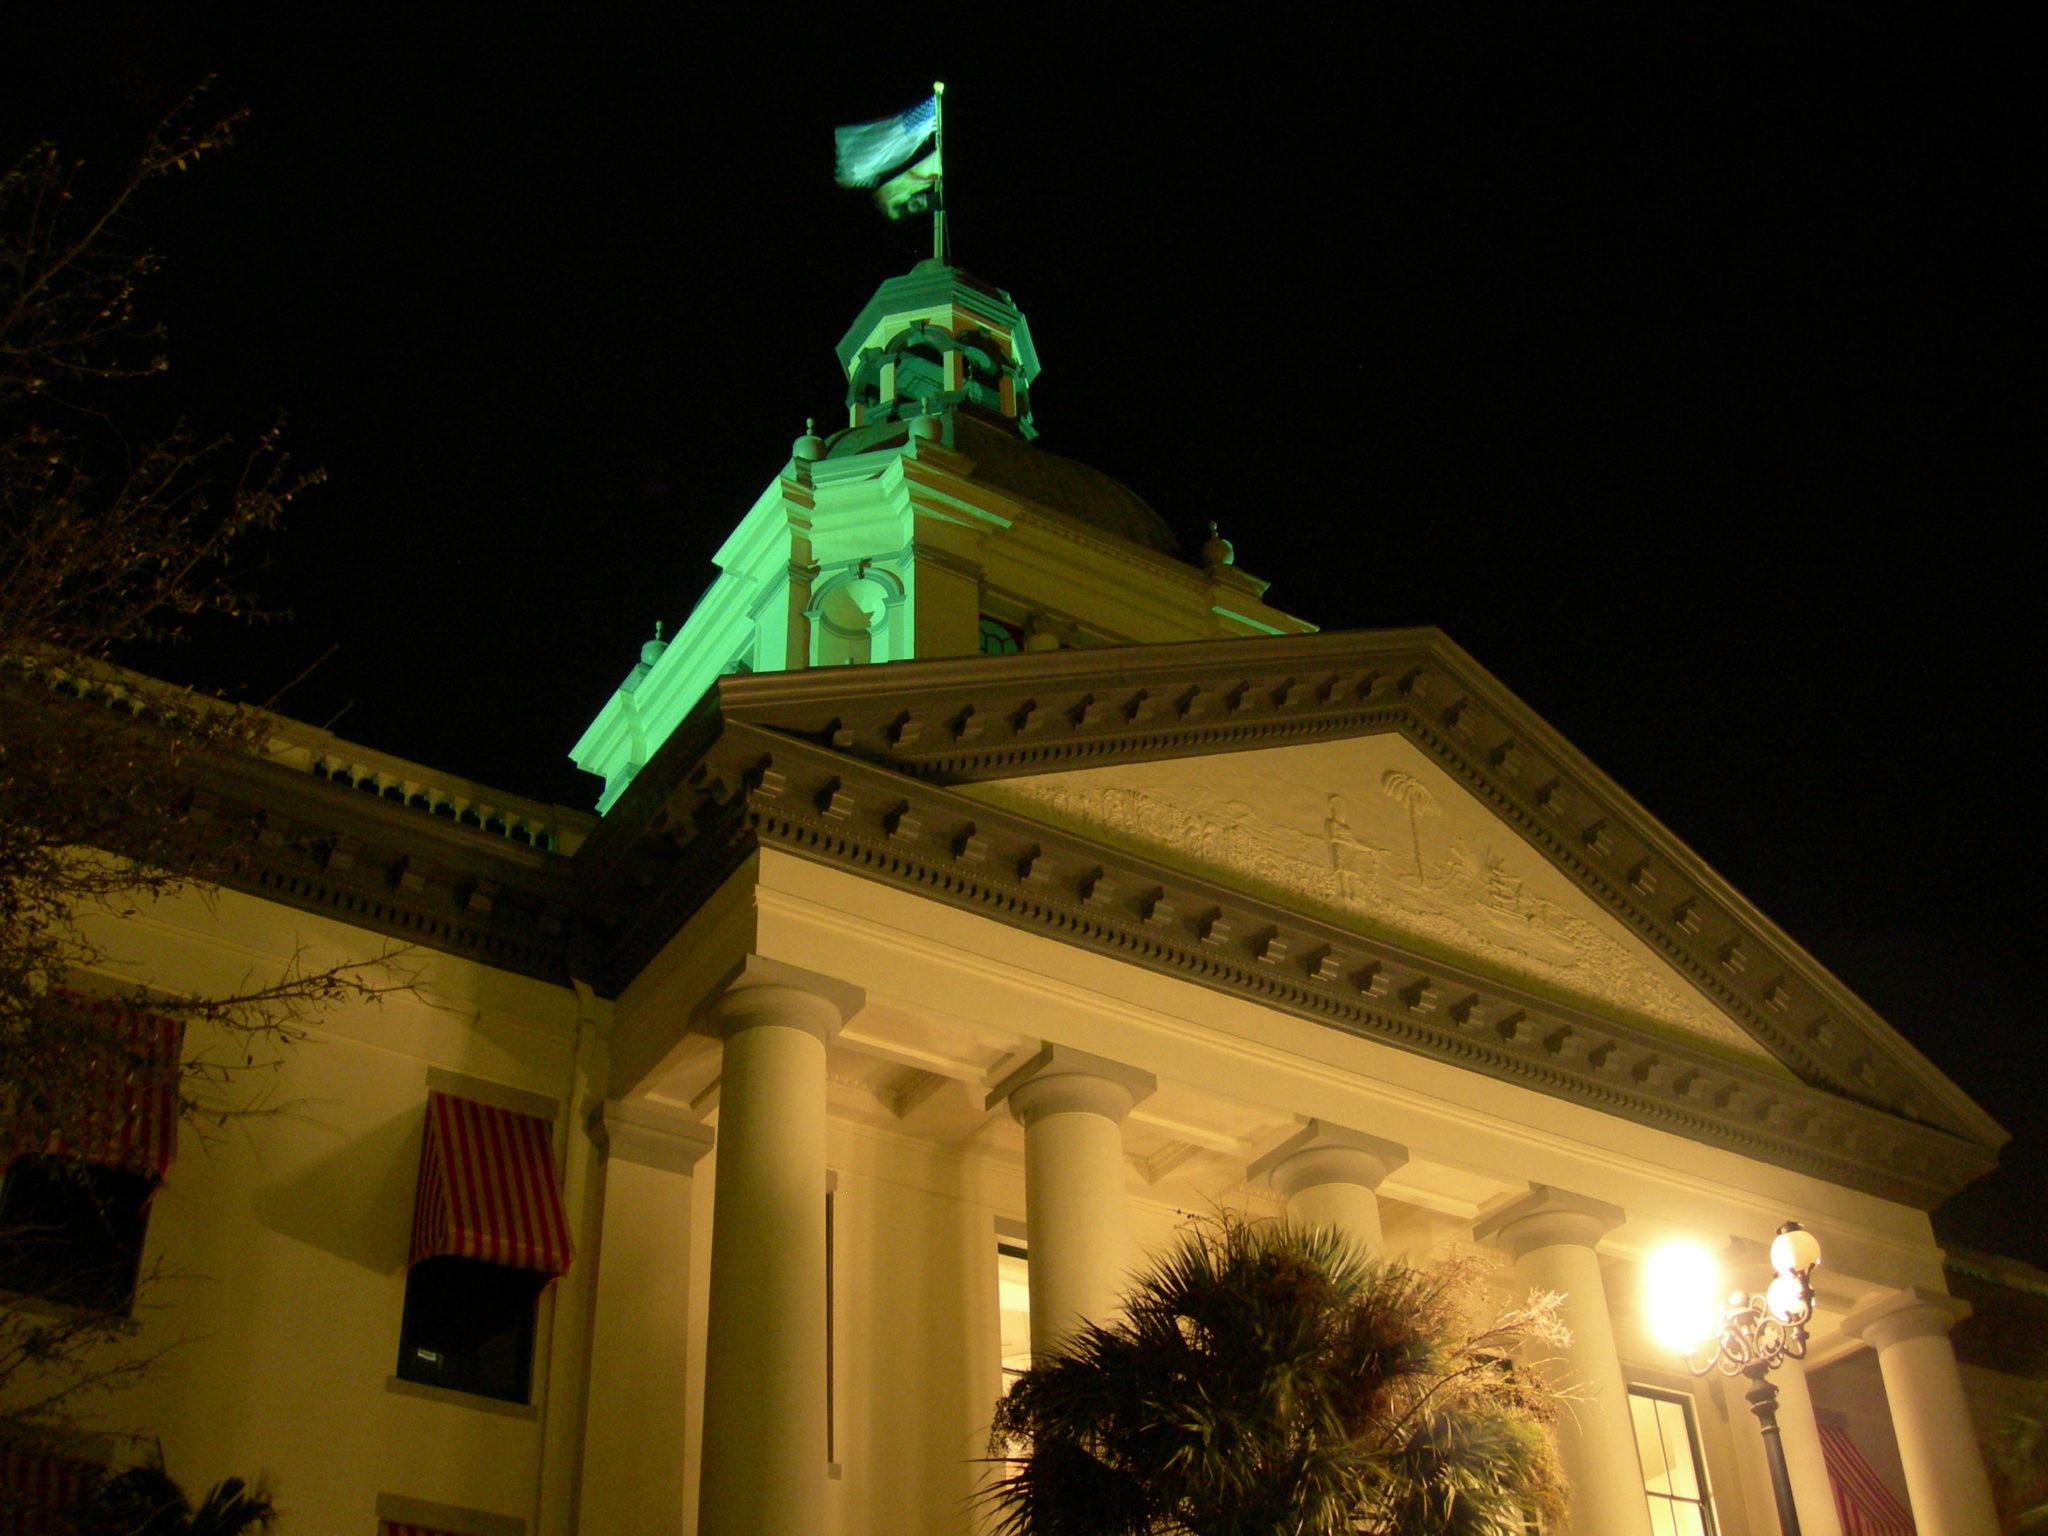 Elected officials flunk Constitution quiz